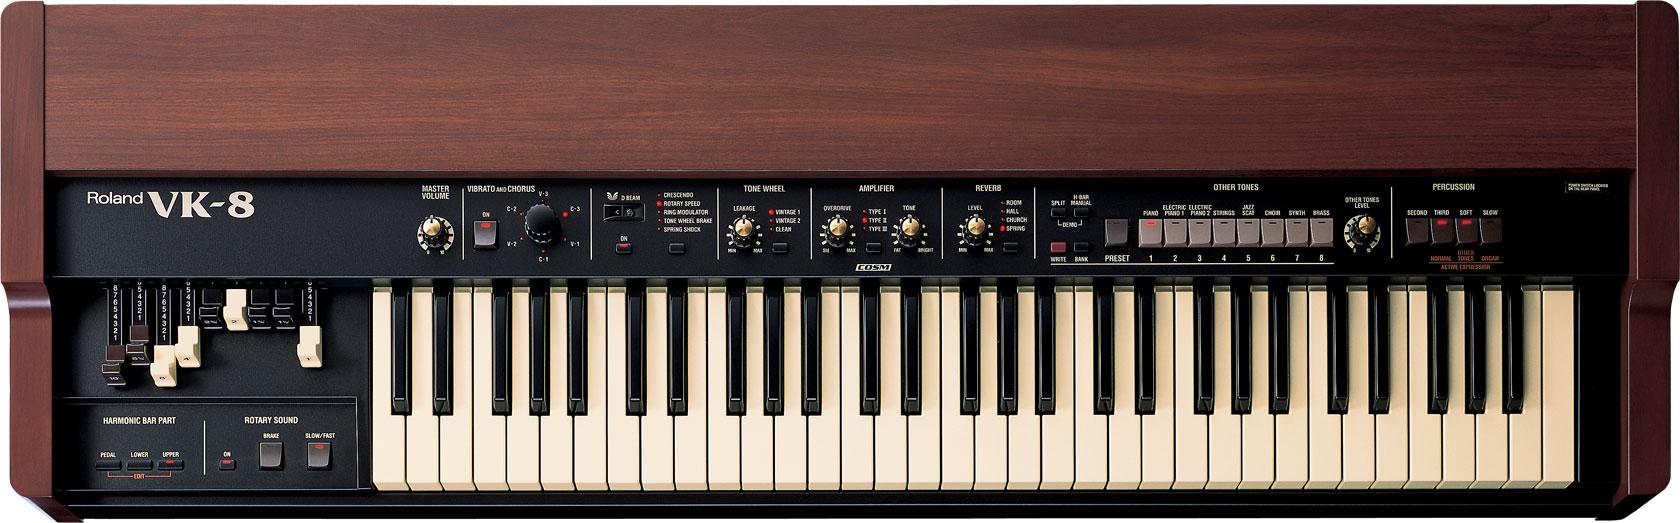 VK-8 | Combo Organ - Roland